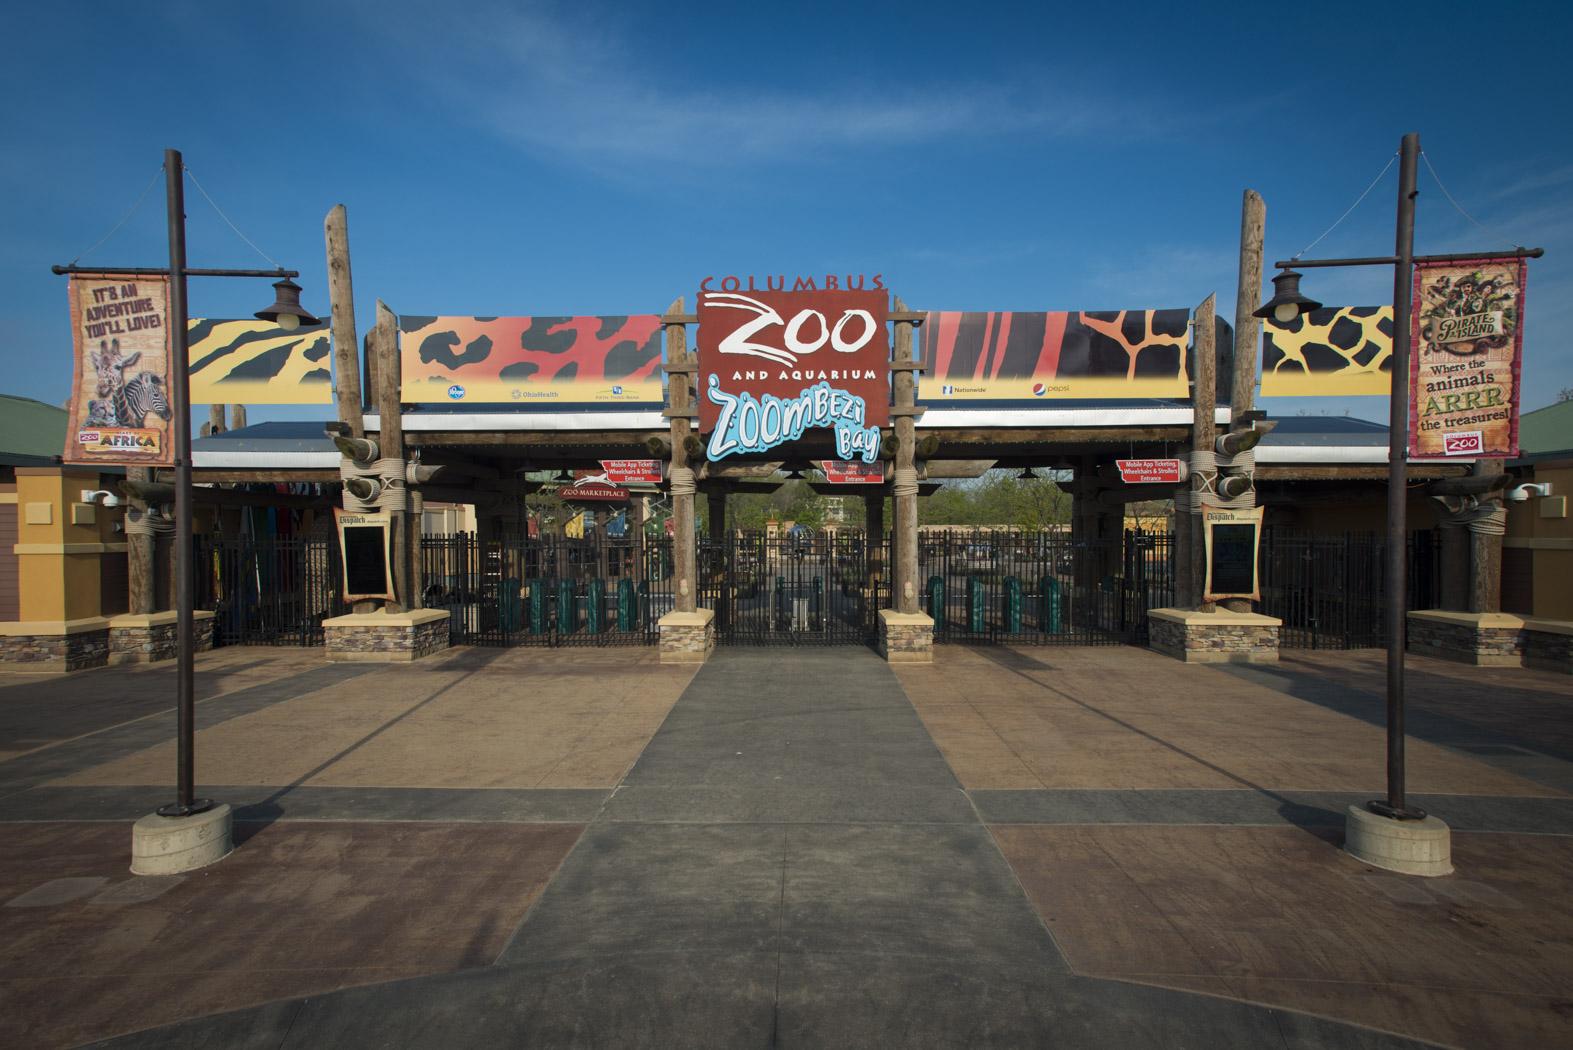 Zoo Entrance  - Grahm S. Jones, Columbus Zoo and Aquarium (1)